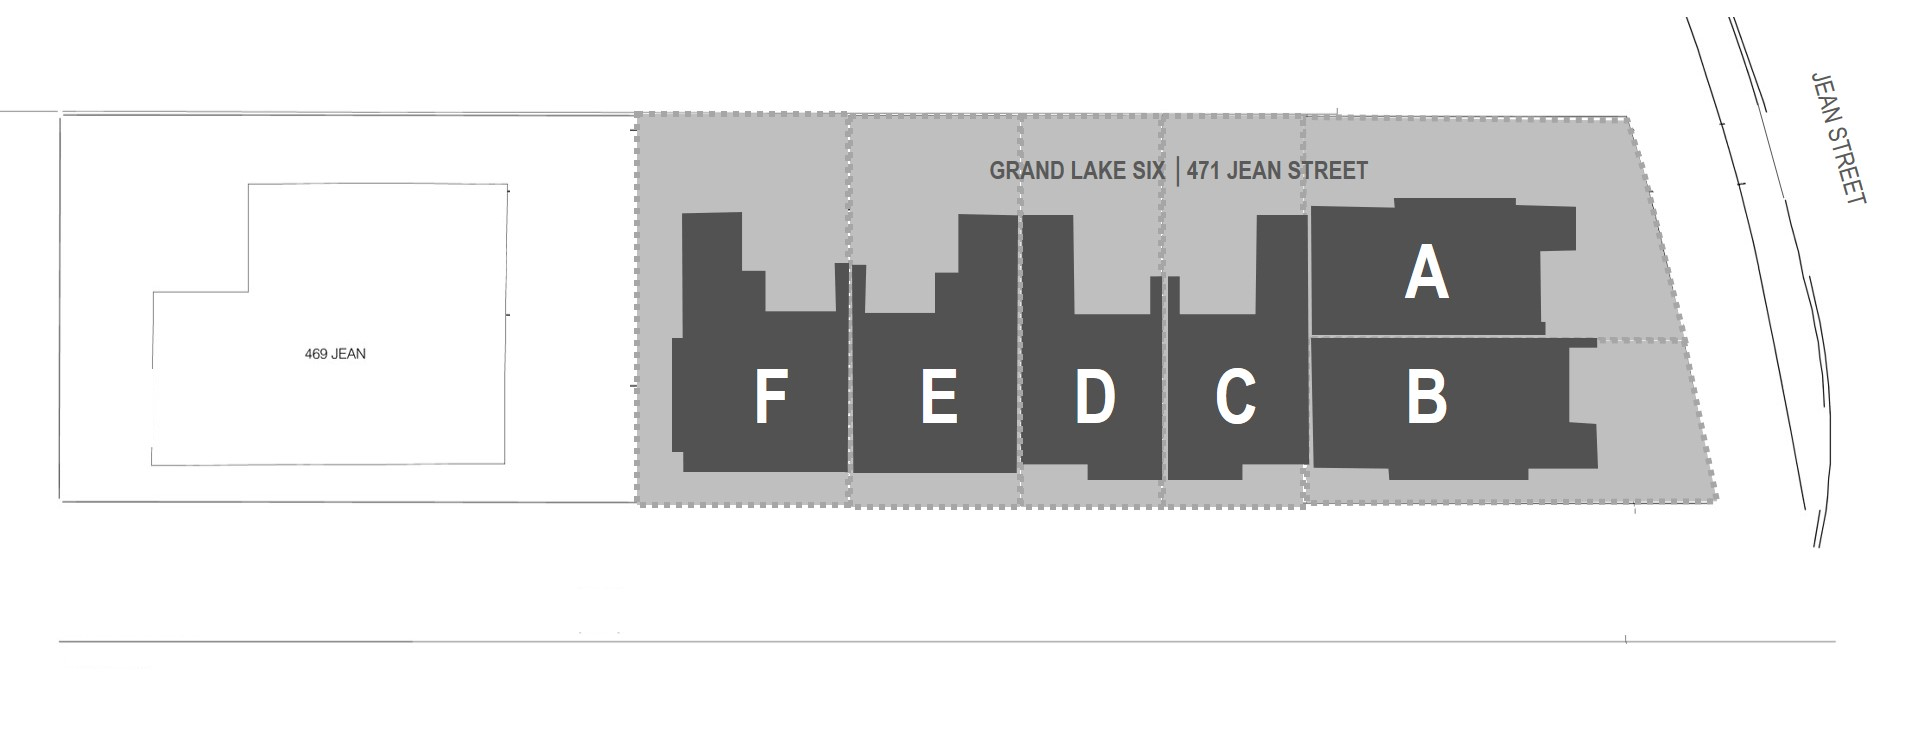 gl6_siteplan.jpg